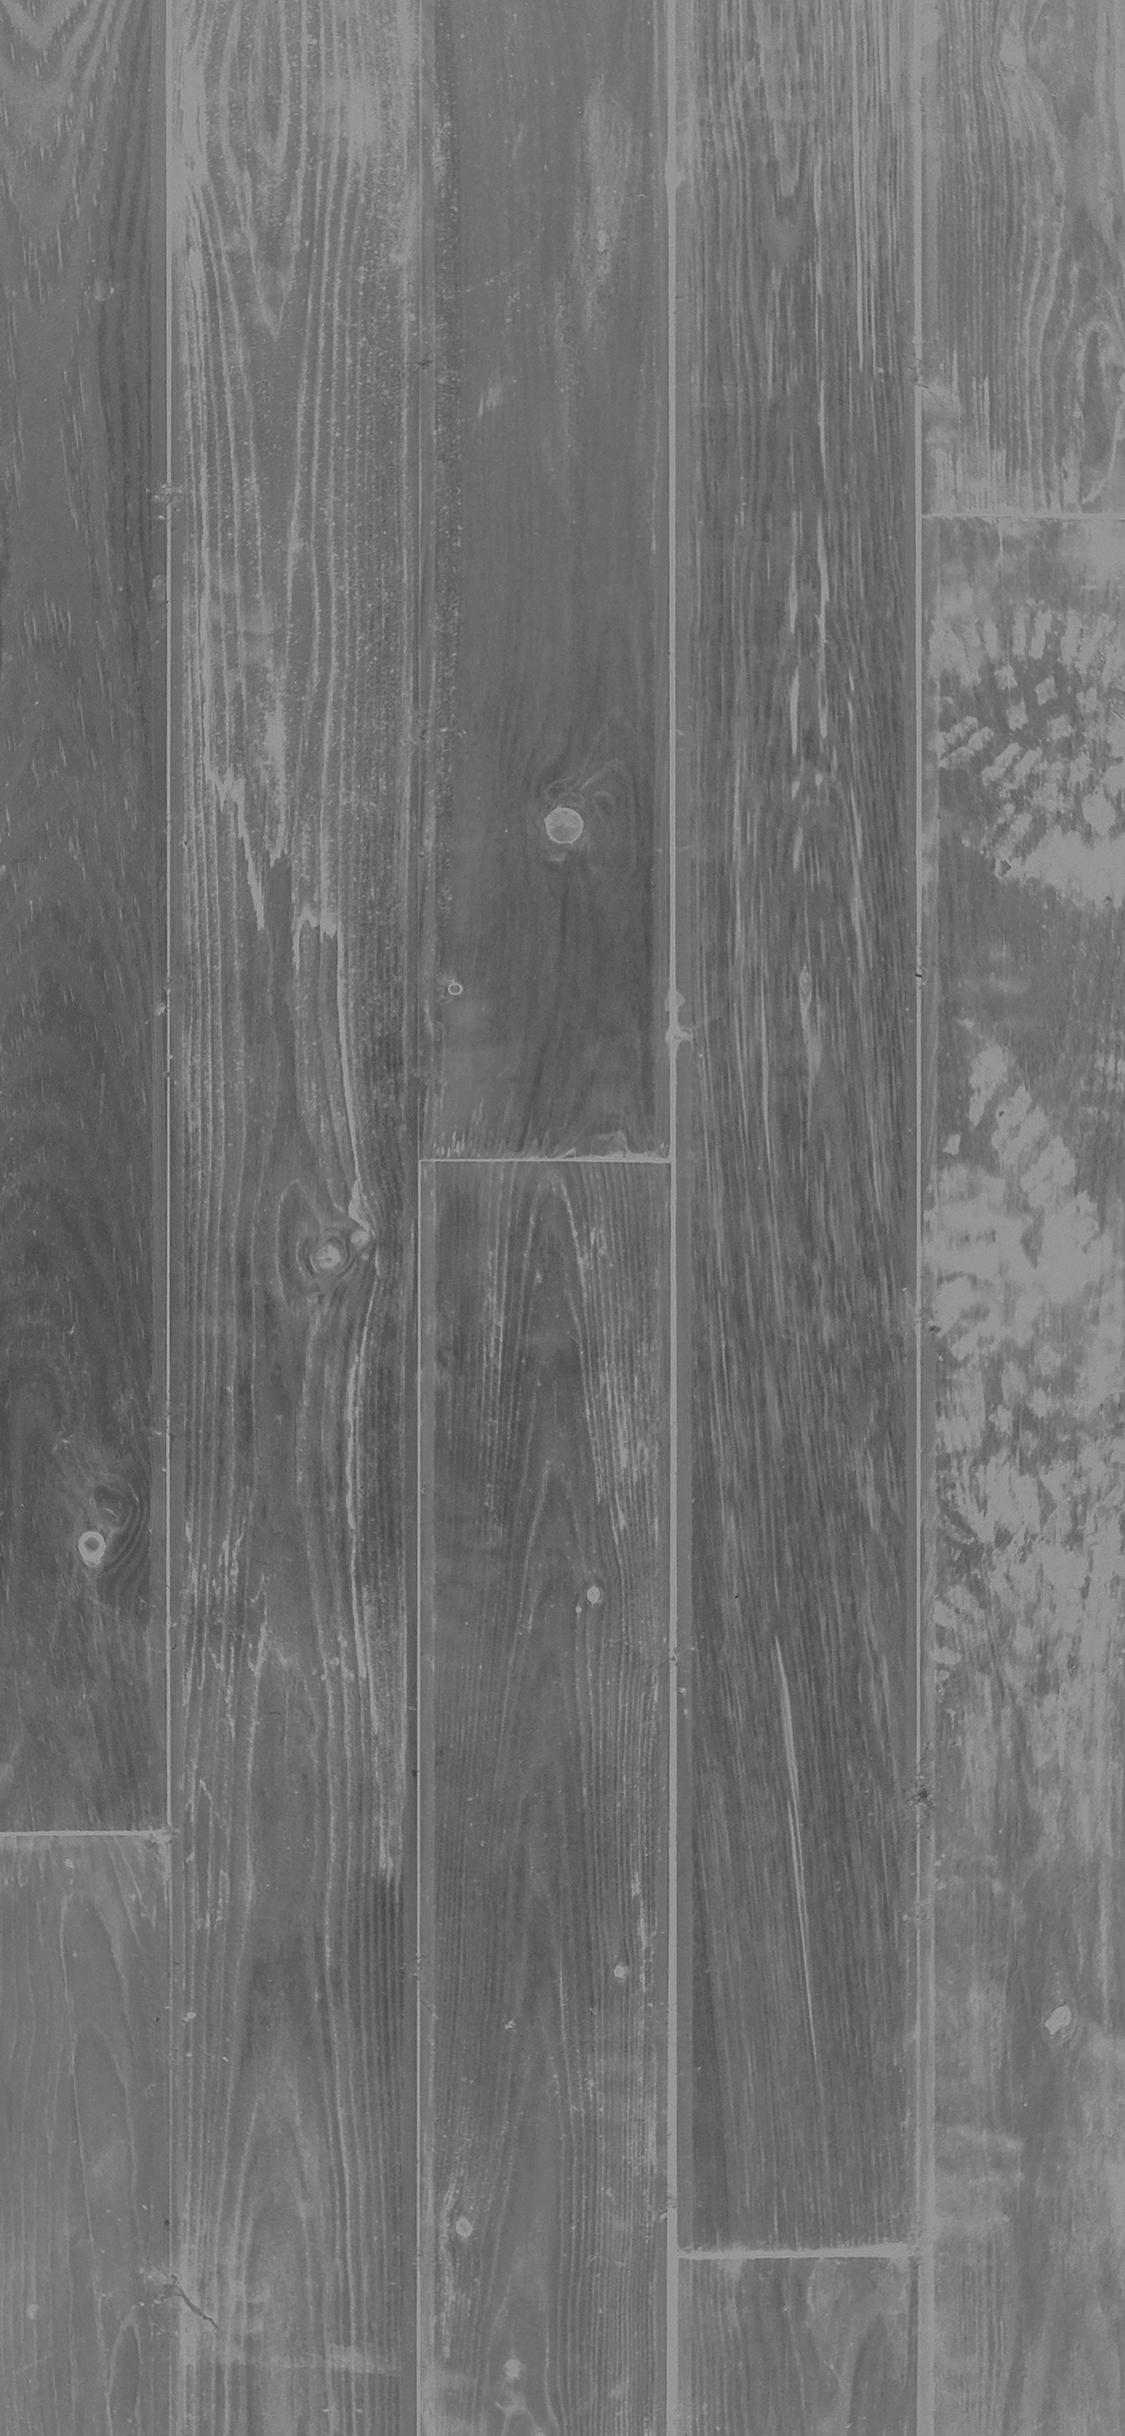 Iphone X - Iphone X Wallpaper Grey , HD Wallpaper & Backgrounds